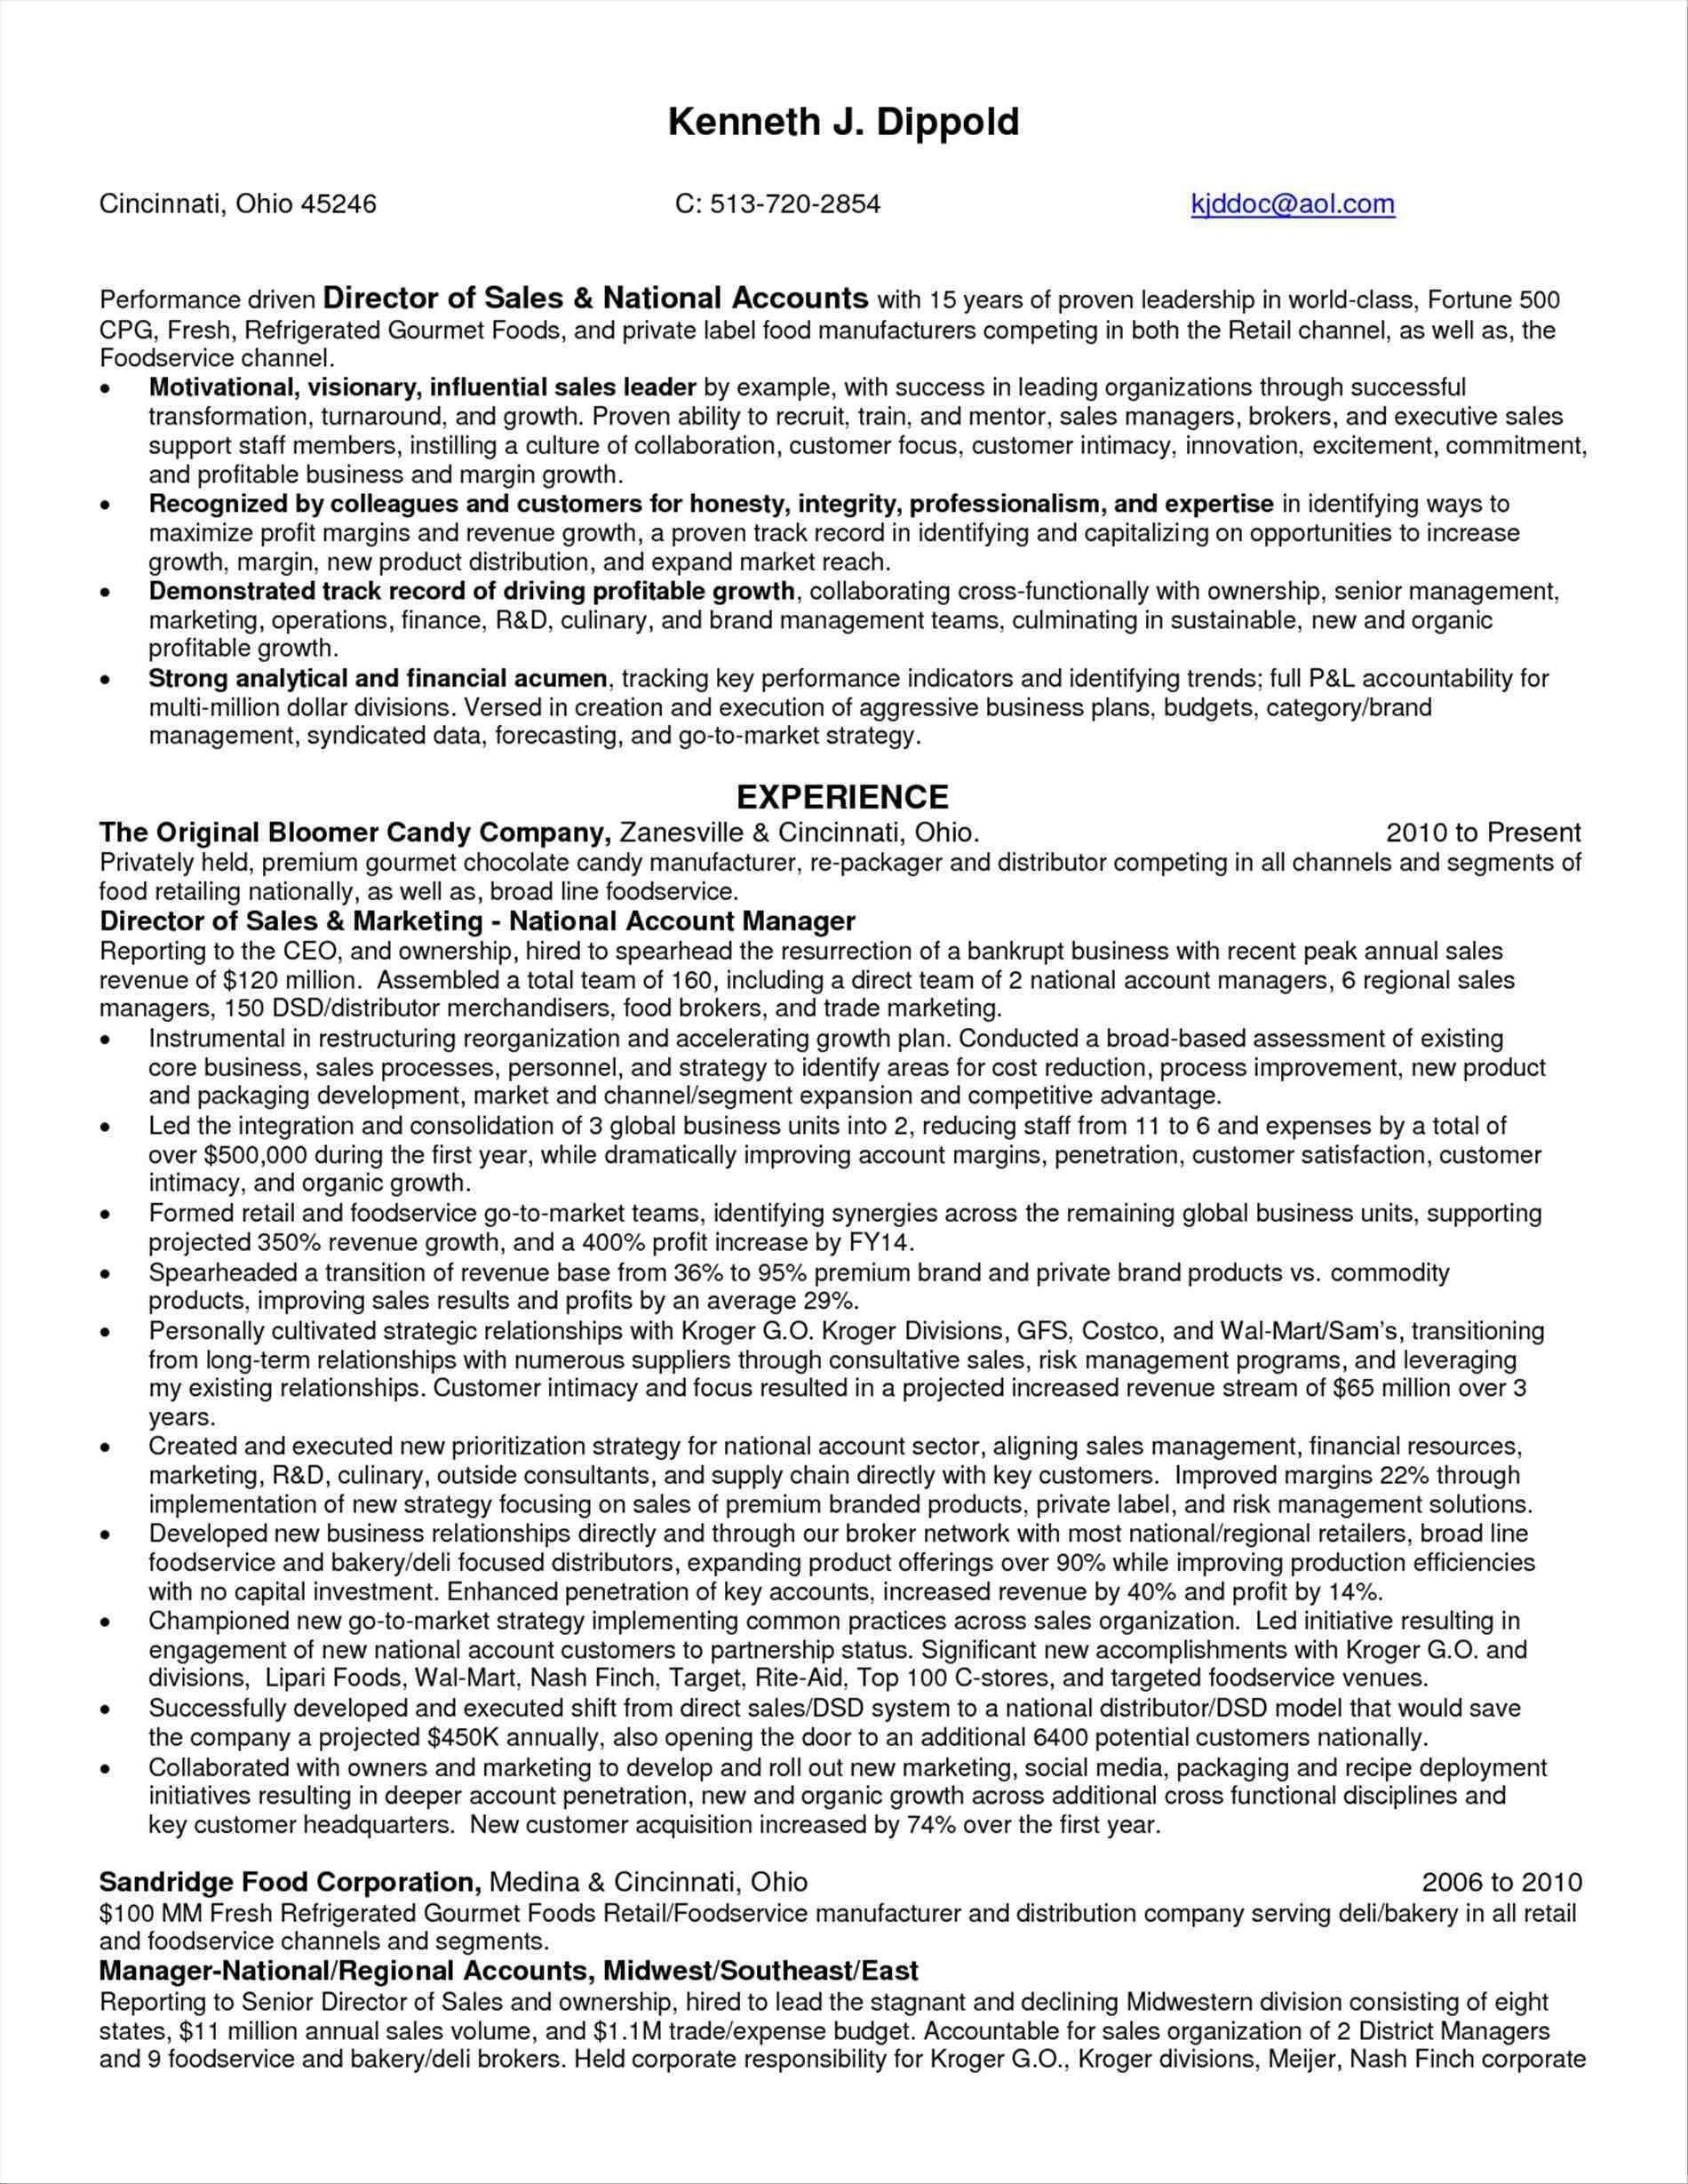 application jvwithmenowcom costco Sample Resume For Costco job ...